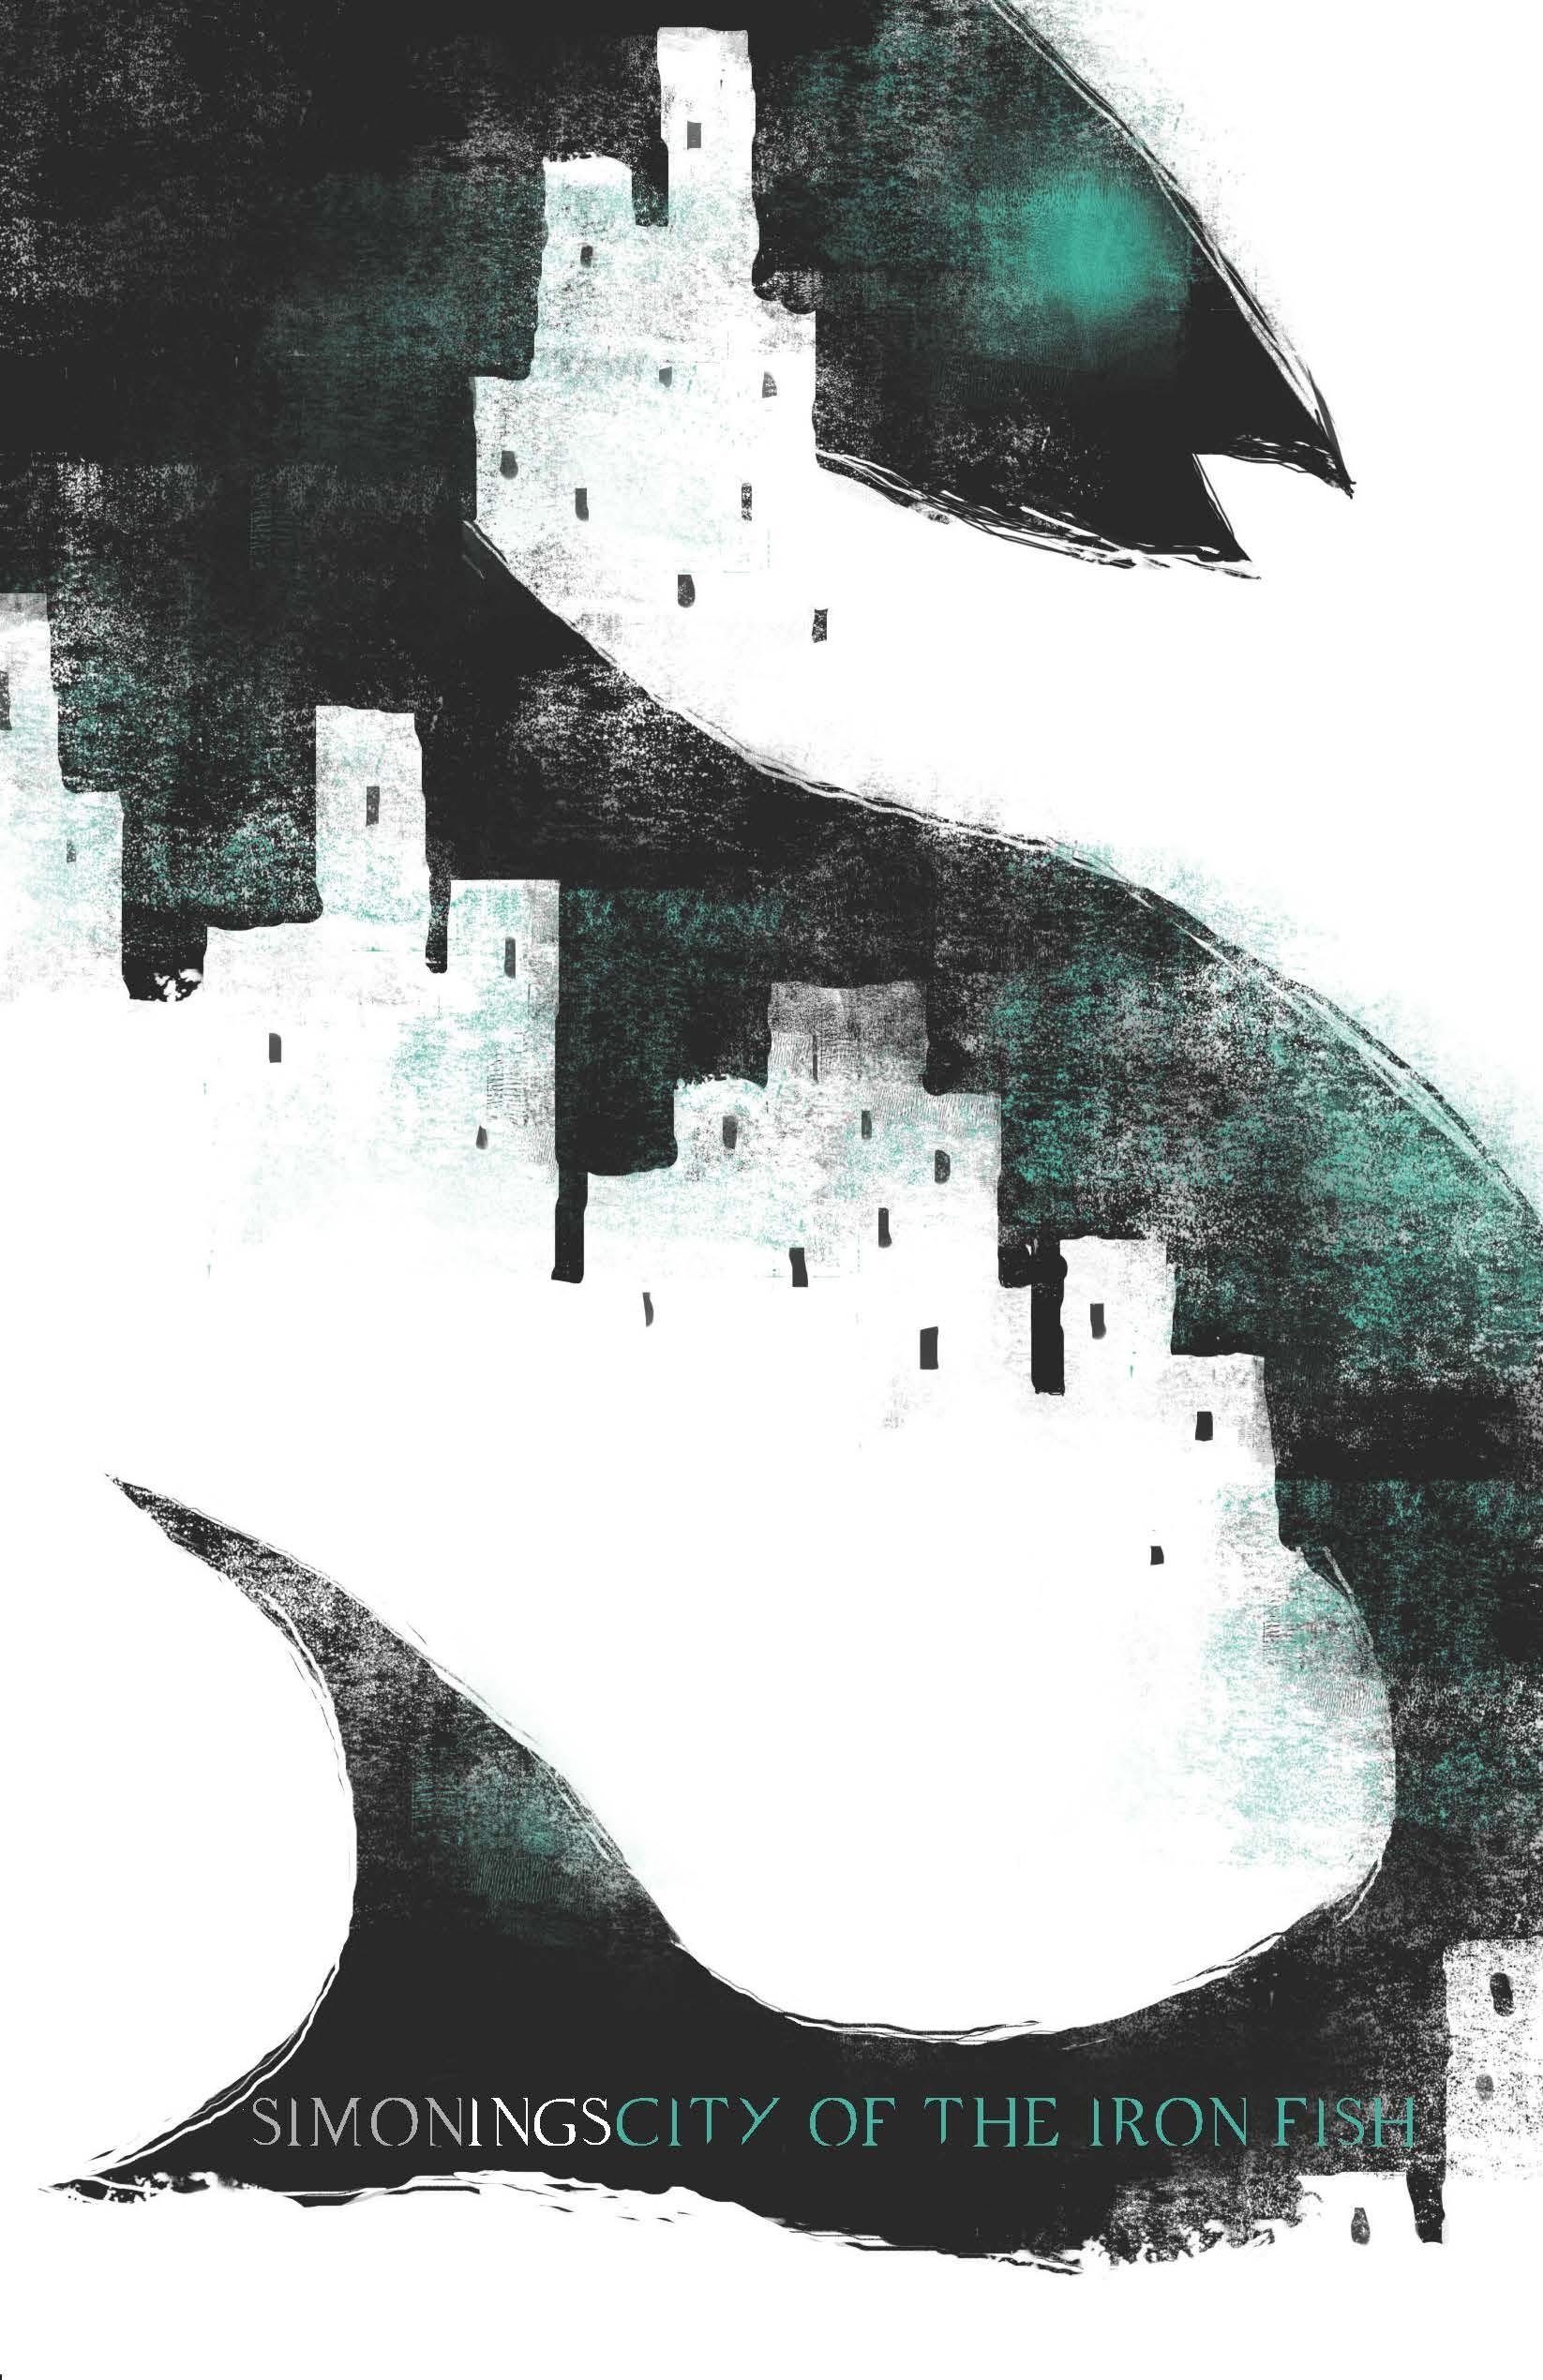 city-of-iron-fish